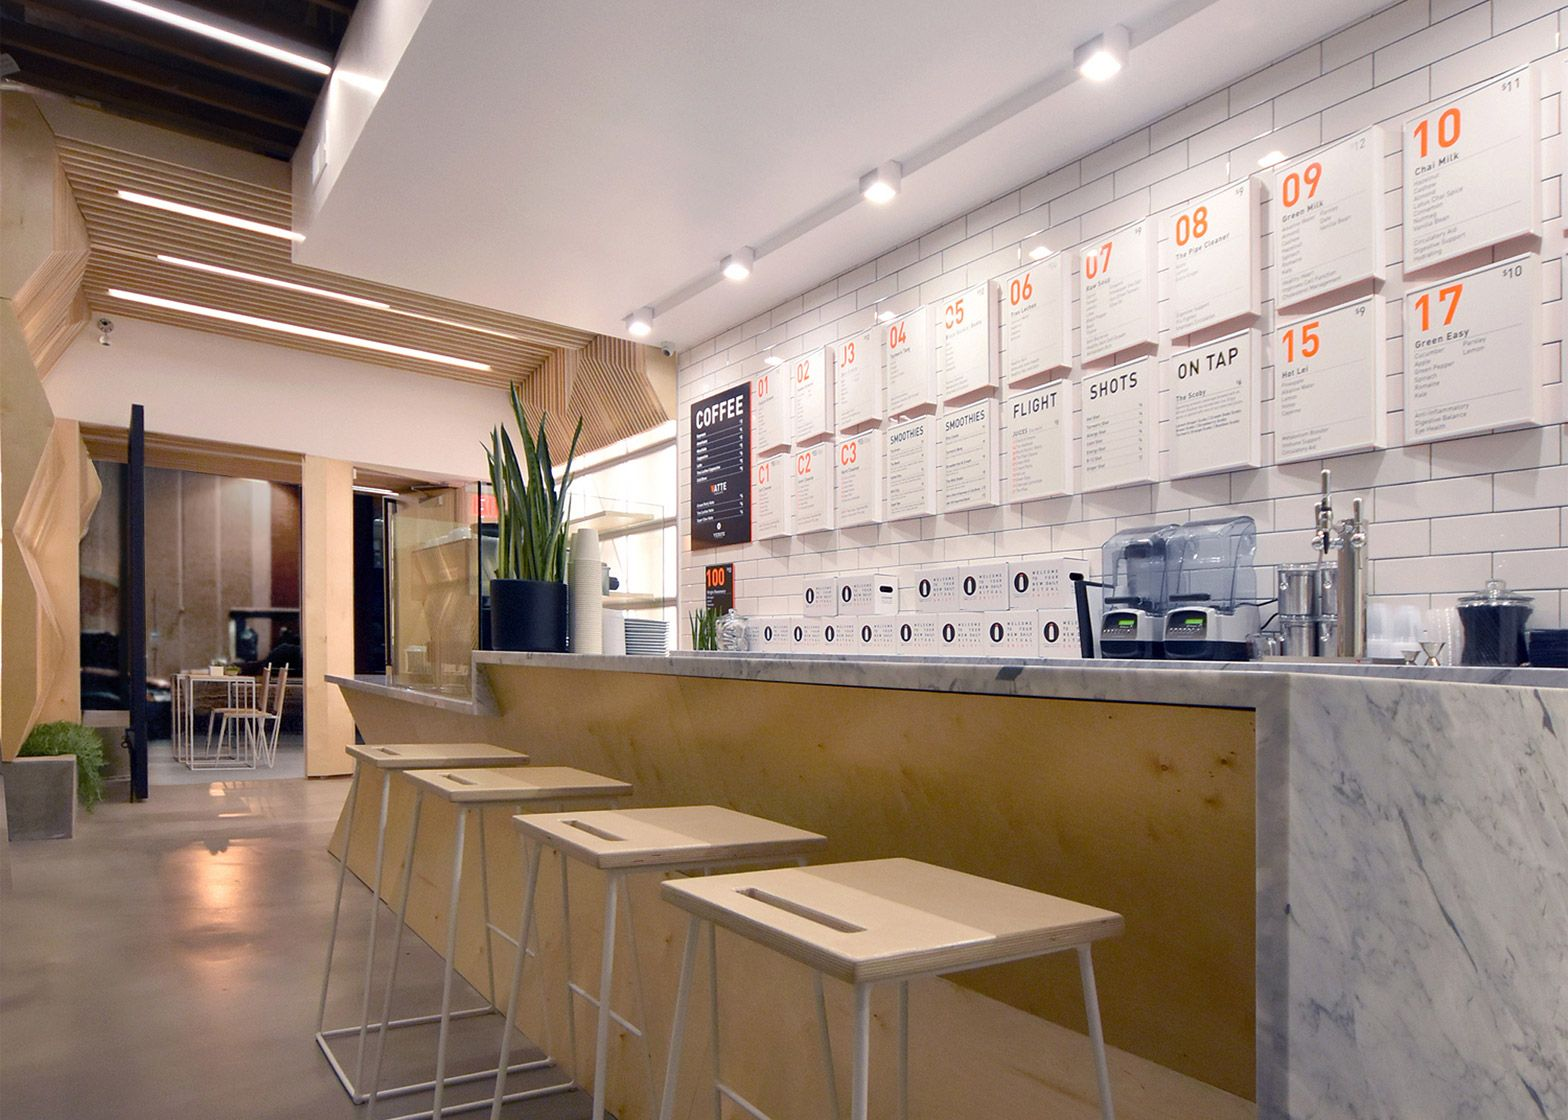 AIndustrial clads juice bar with geometric plywood hospitality